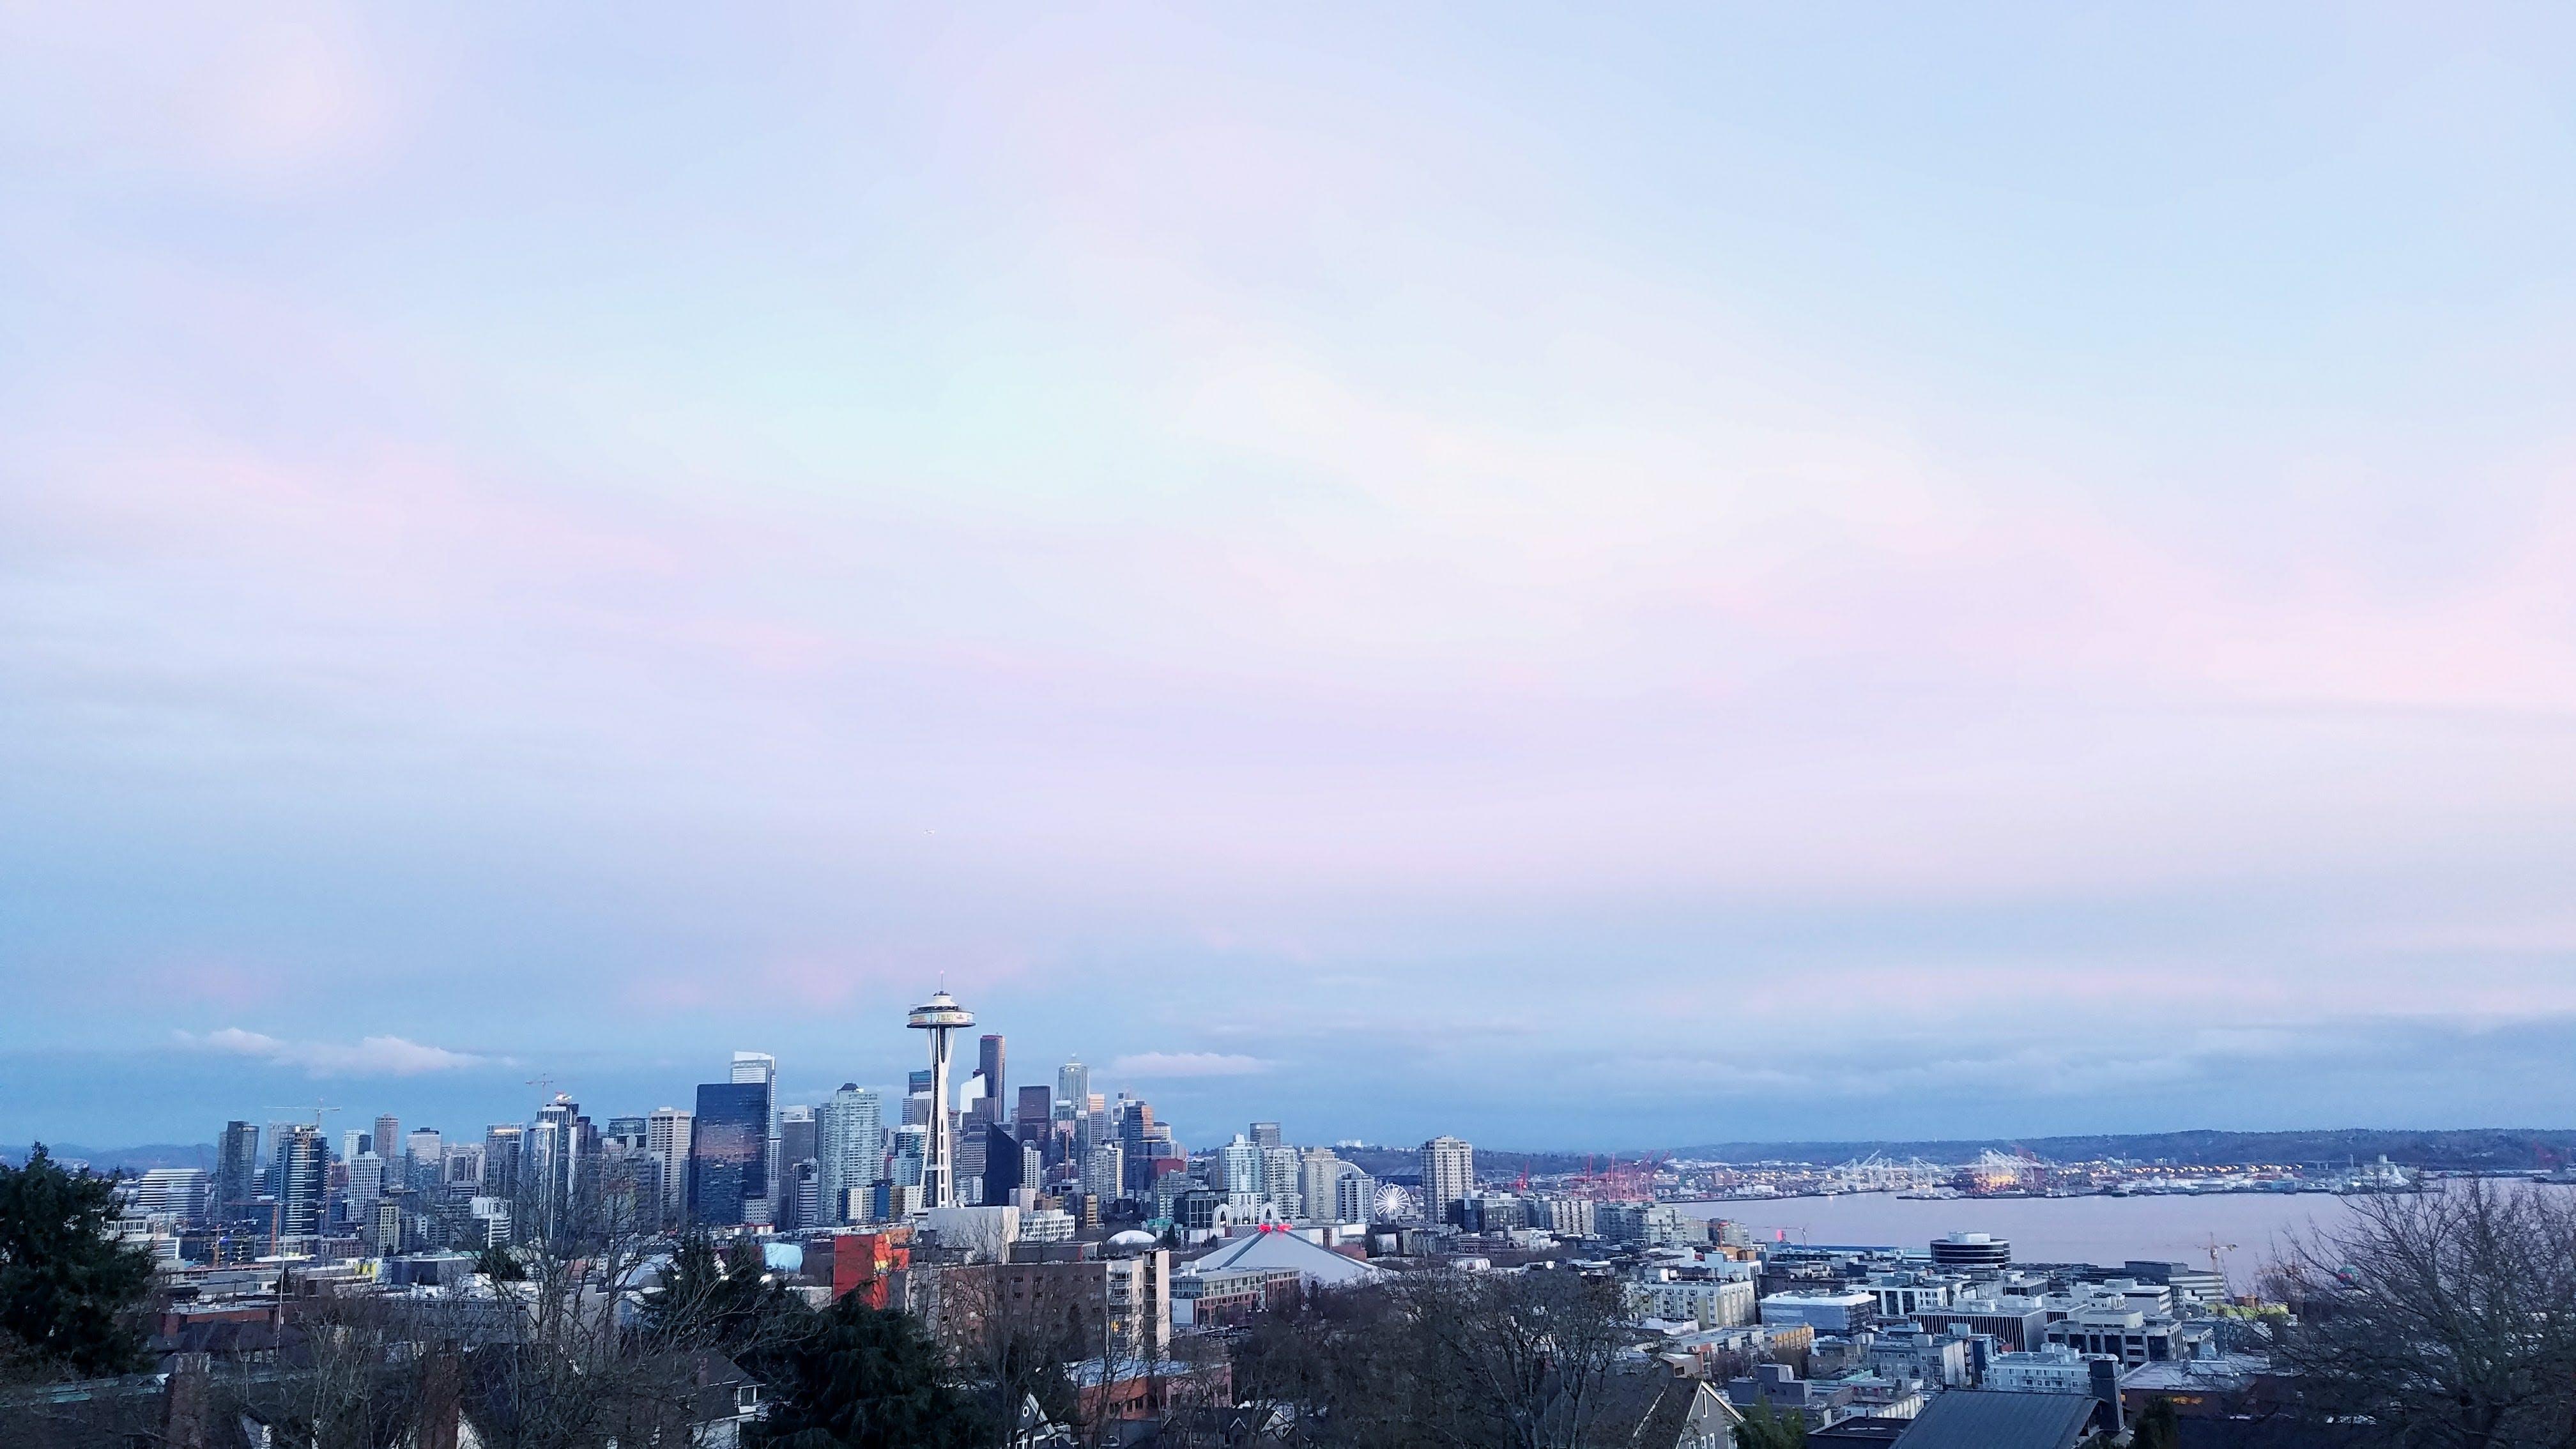 Seattle skyline with a purple haze